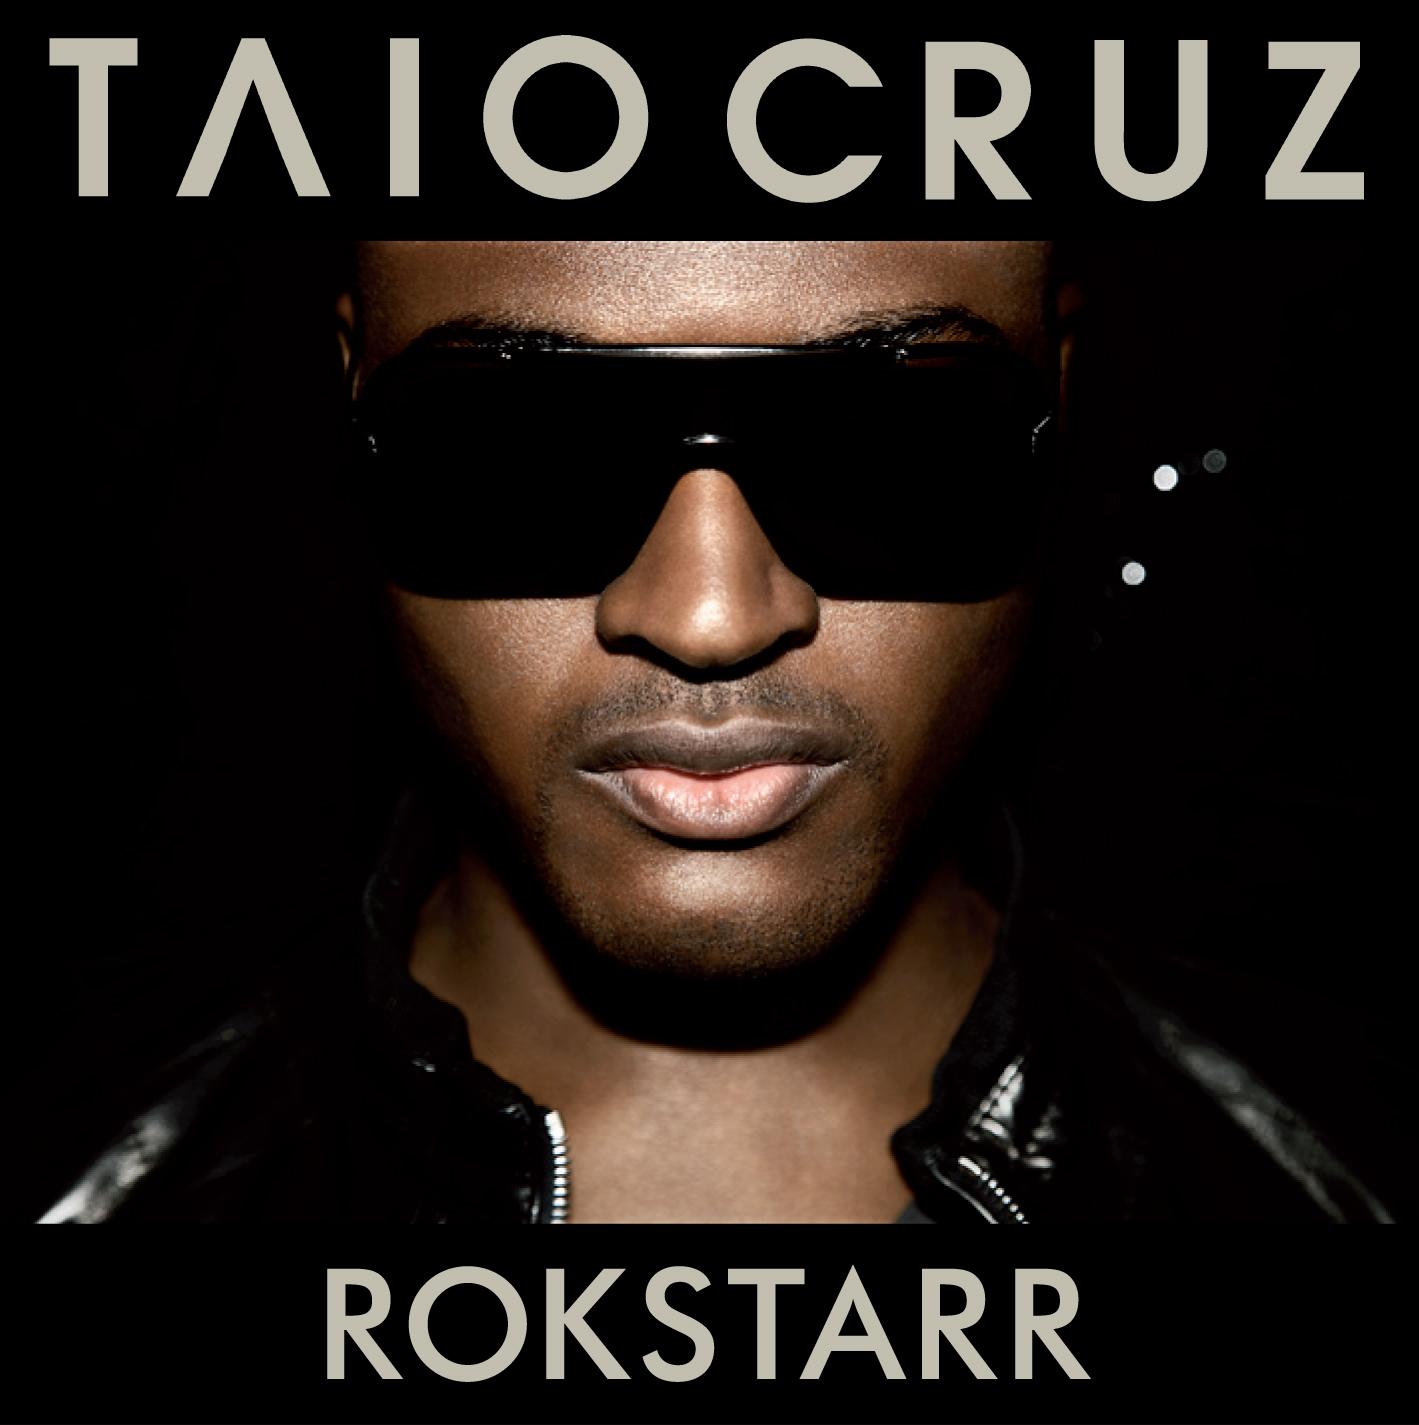 Taio Cruz – Rokstarr (Album Download)